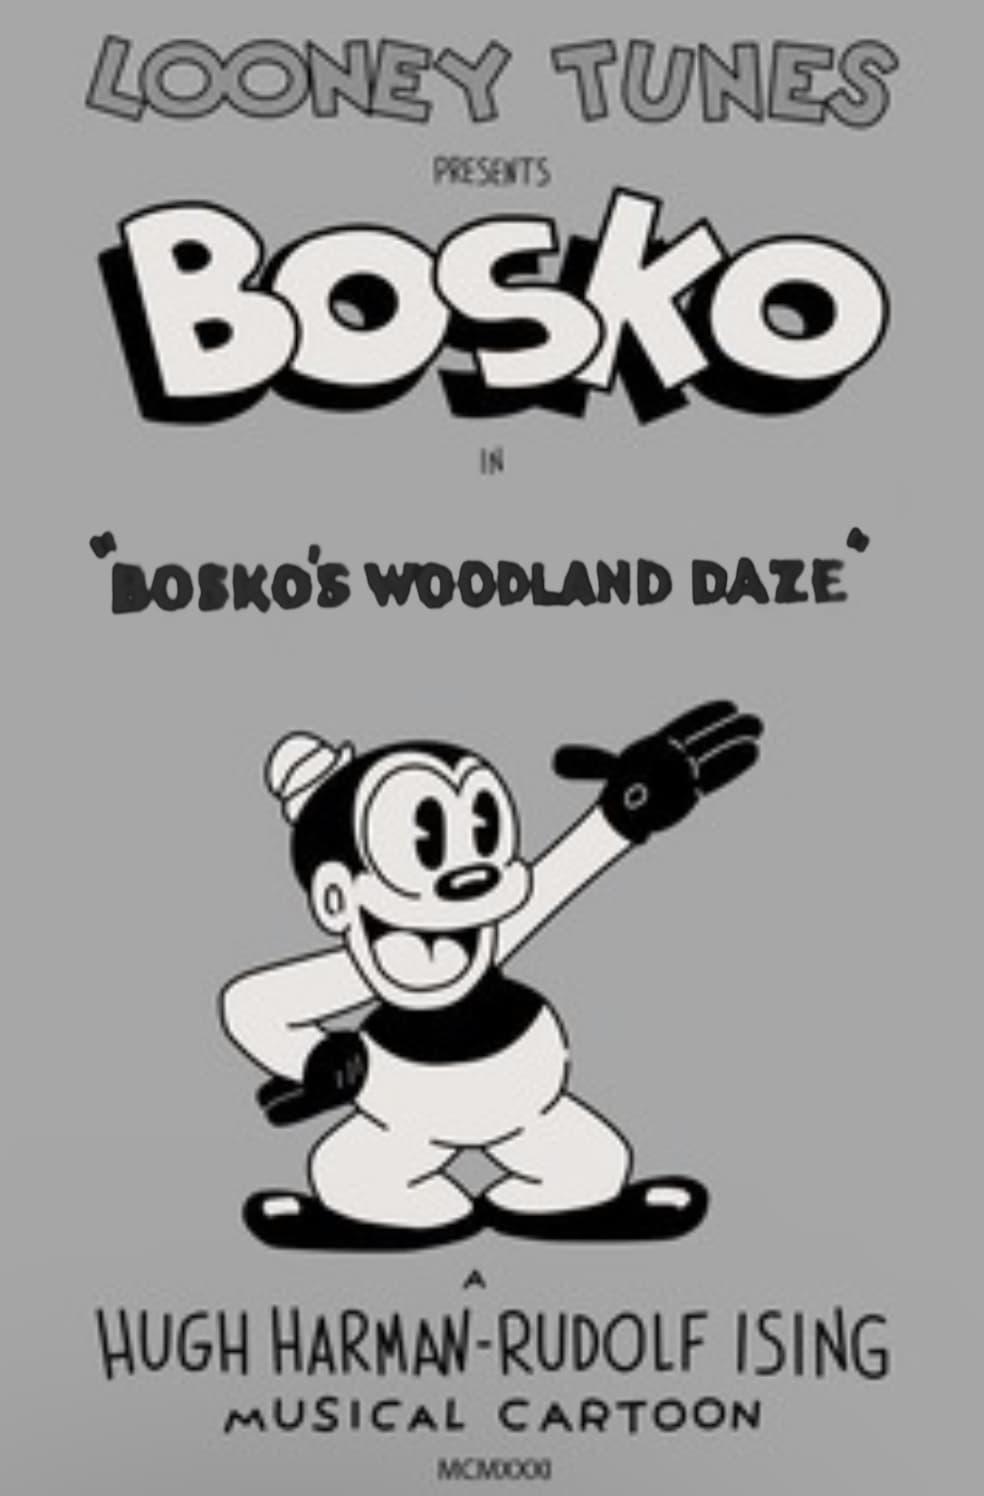 Bosko's Woodland Daze